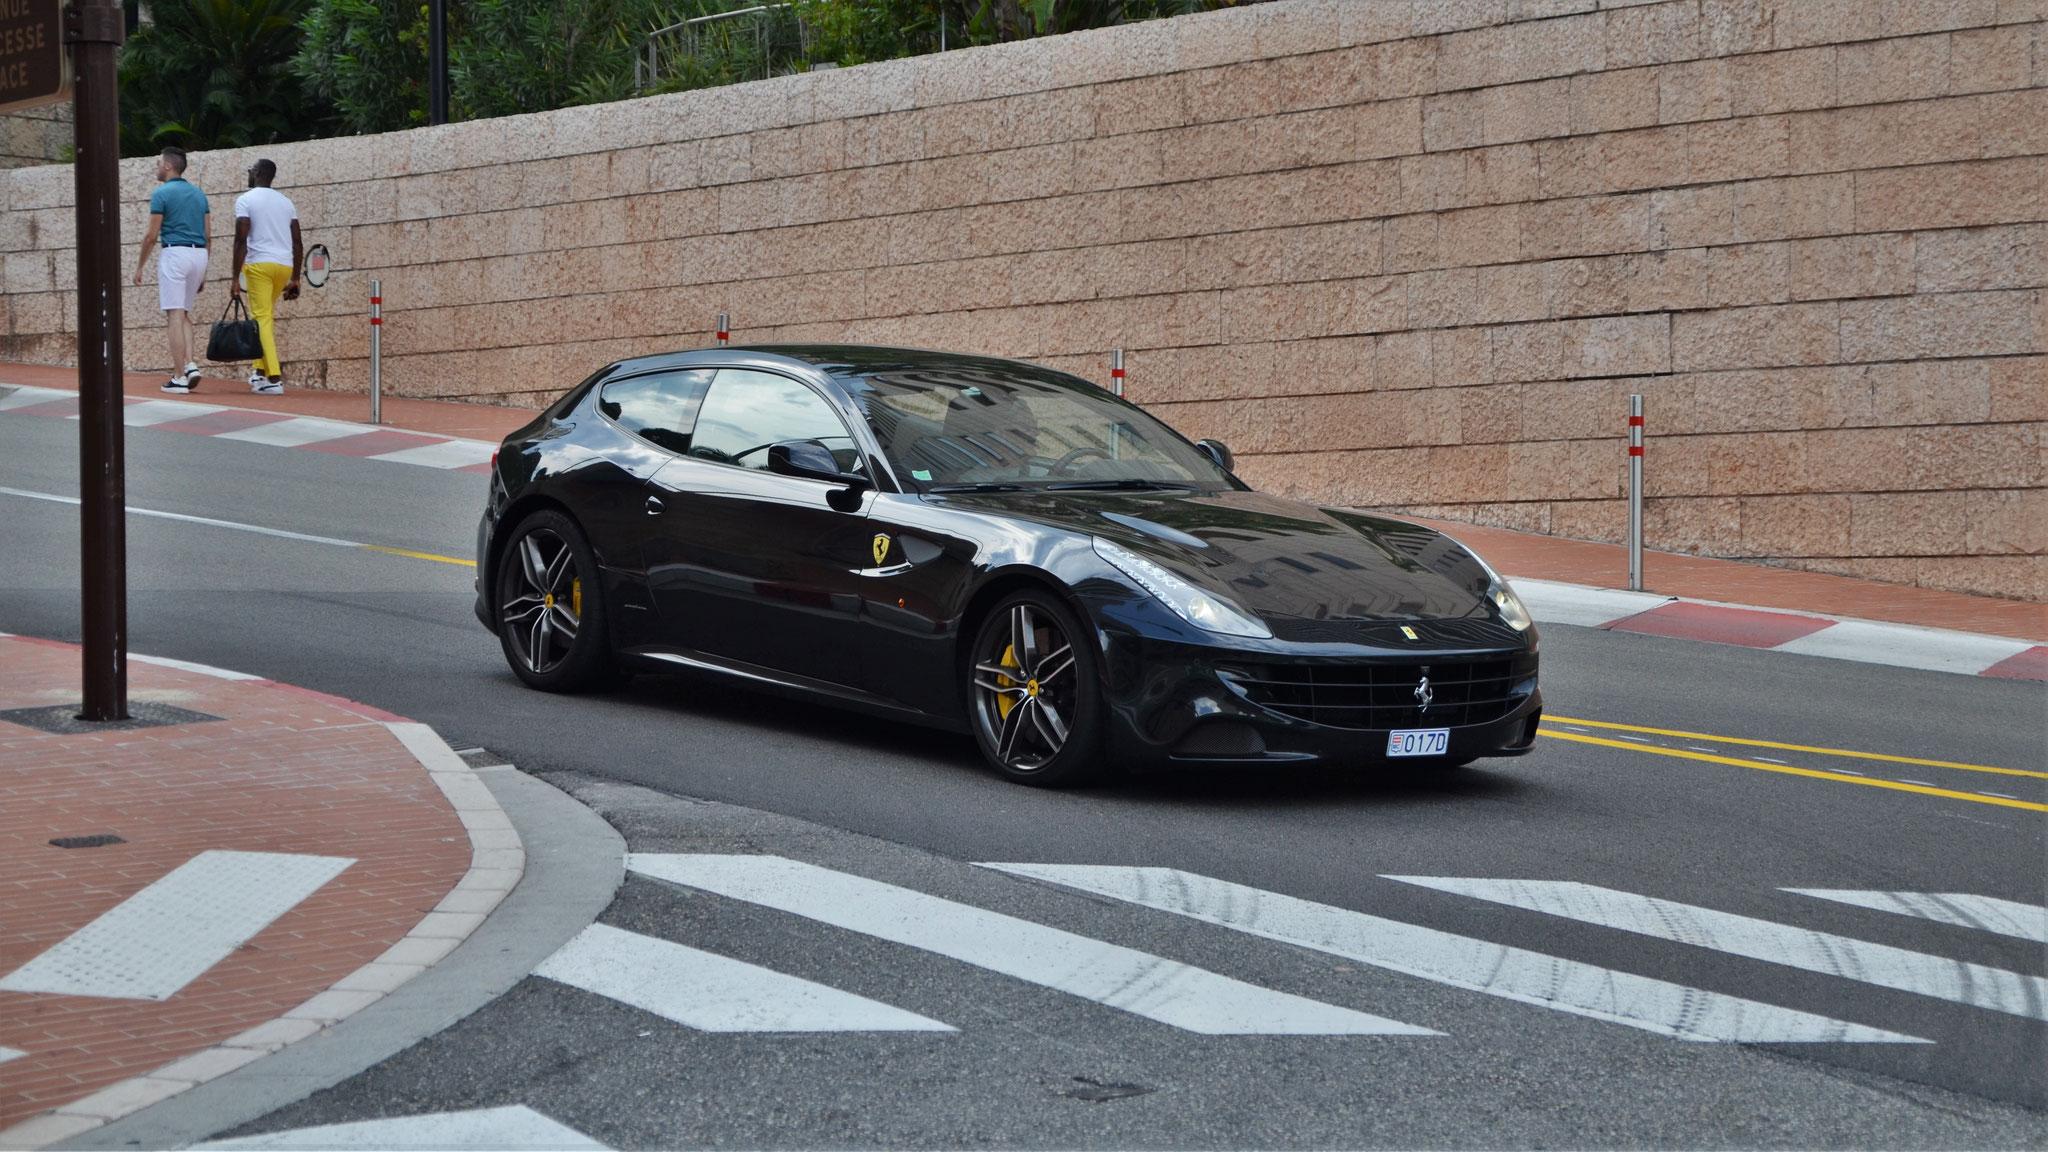 Ferrari FF - 017D (MC)